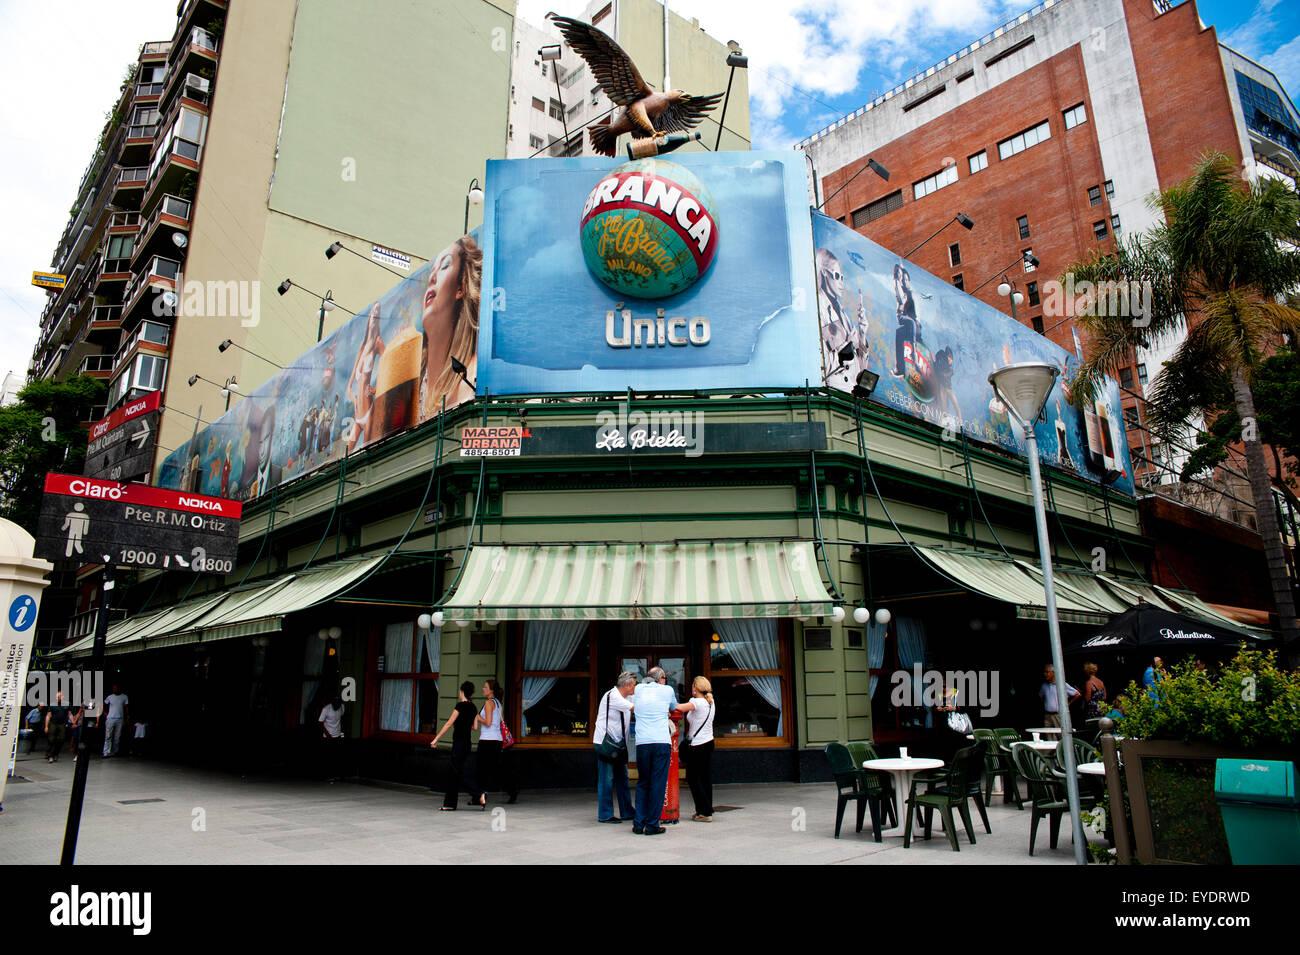 Cafe La Biela, Recoleta, Buenos Aires, Argentina - Stock Image